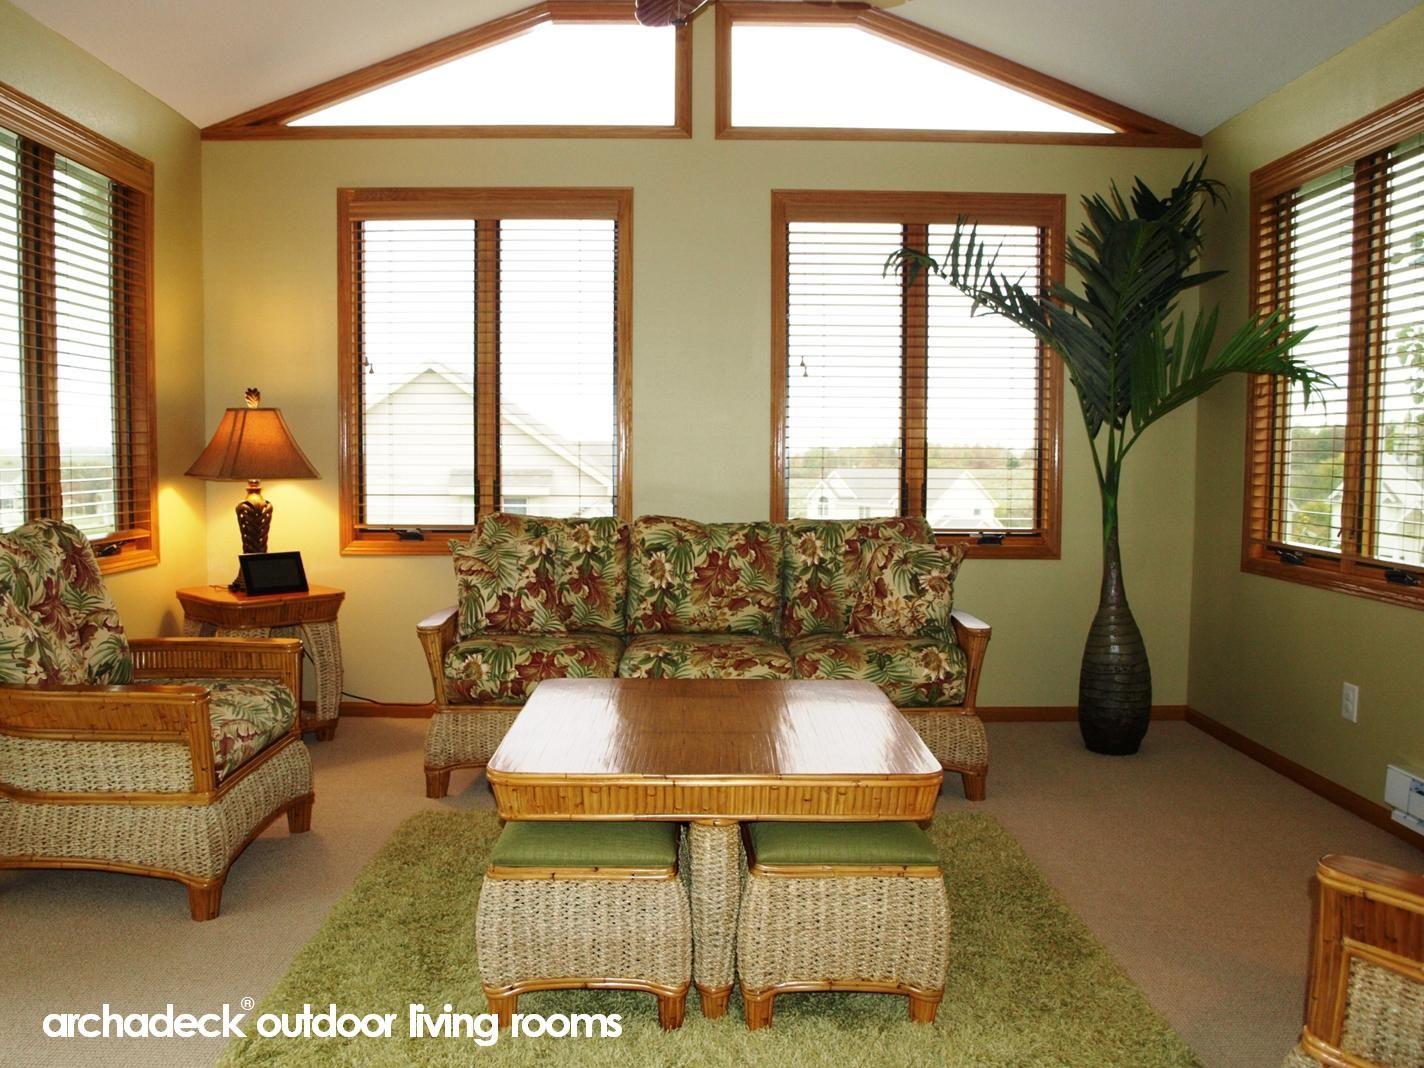 Four Seasons Room Designs Ideas